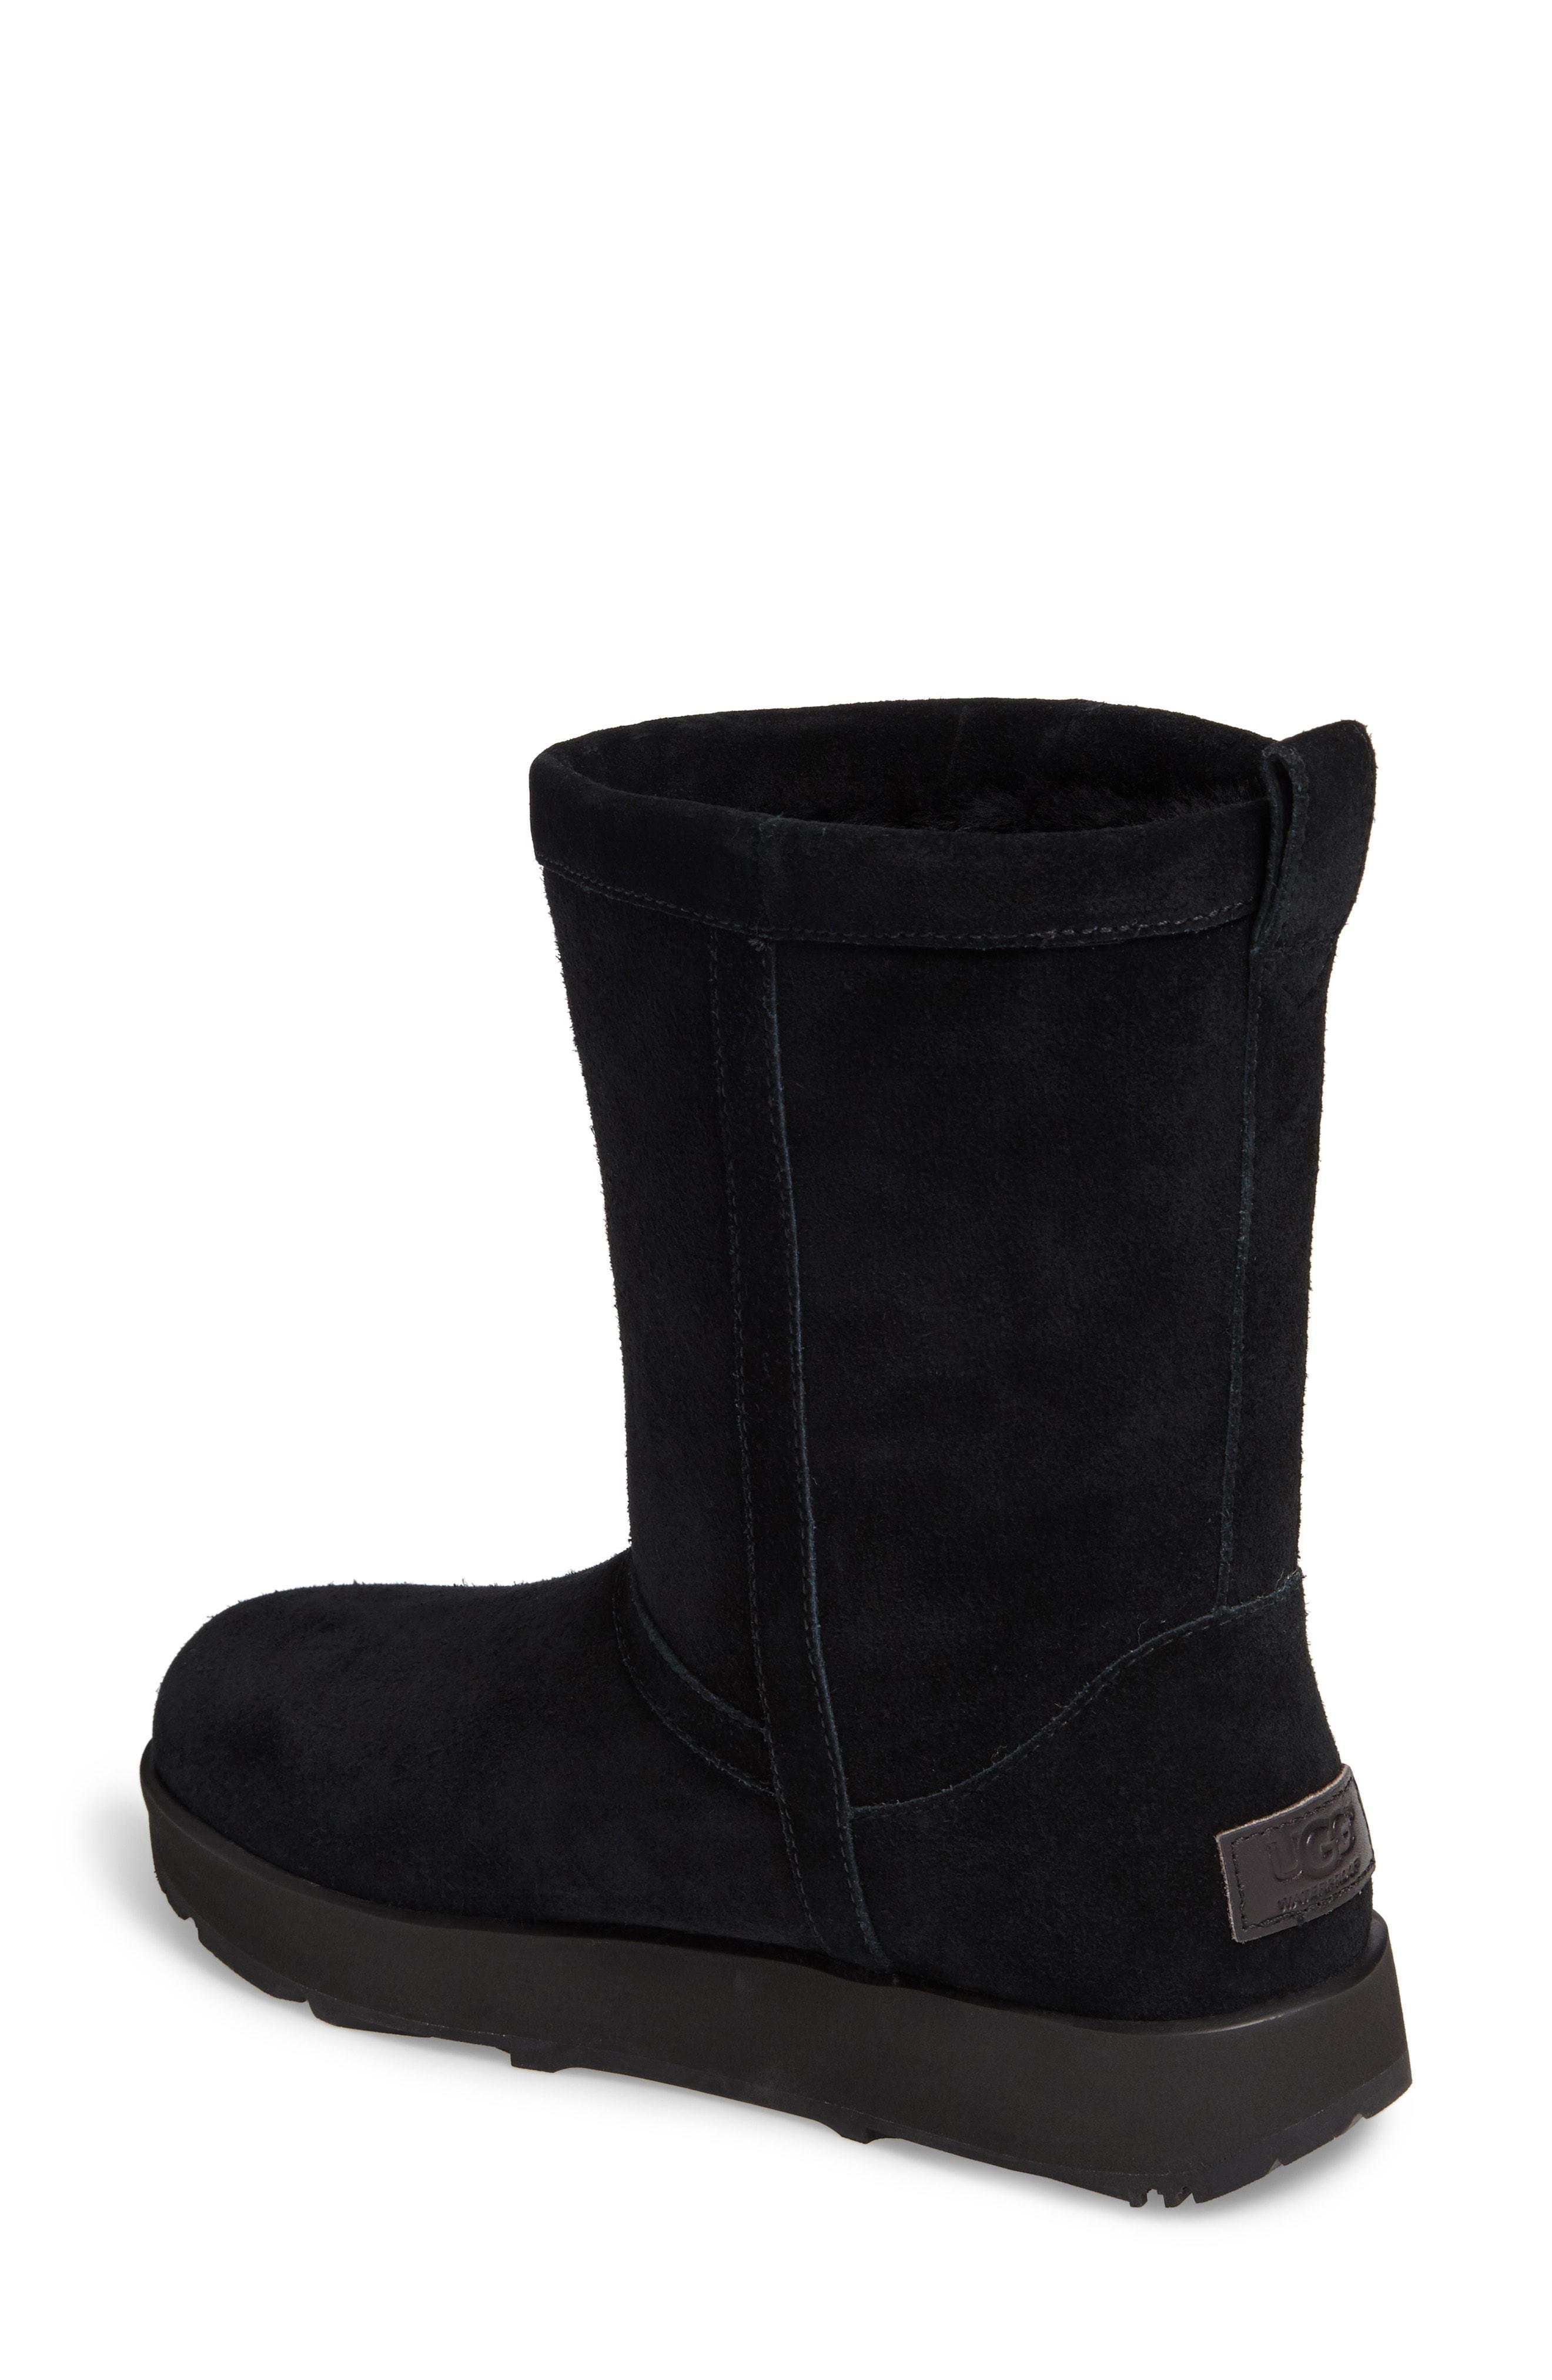 ccf130a788 Ugg Women s Classic Short Waterproof Suede   Sheepskin Booties In Black  Suede